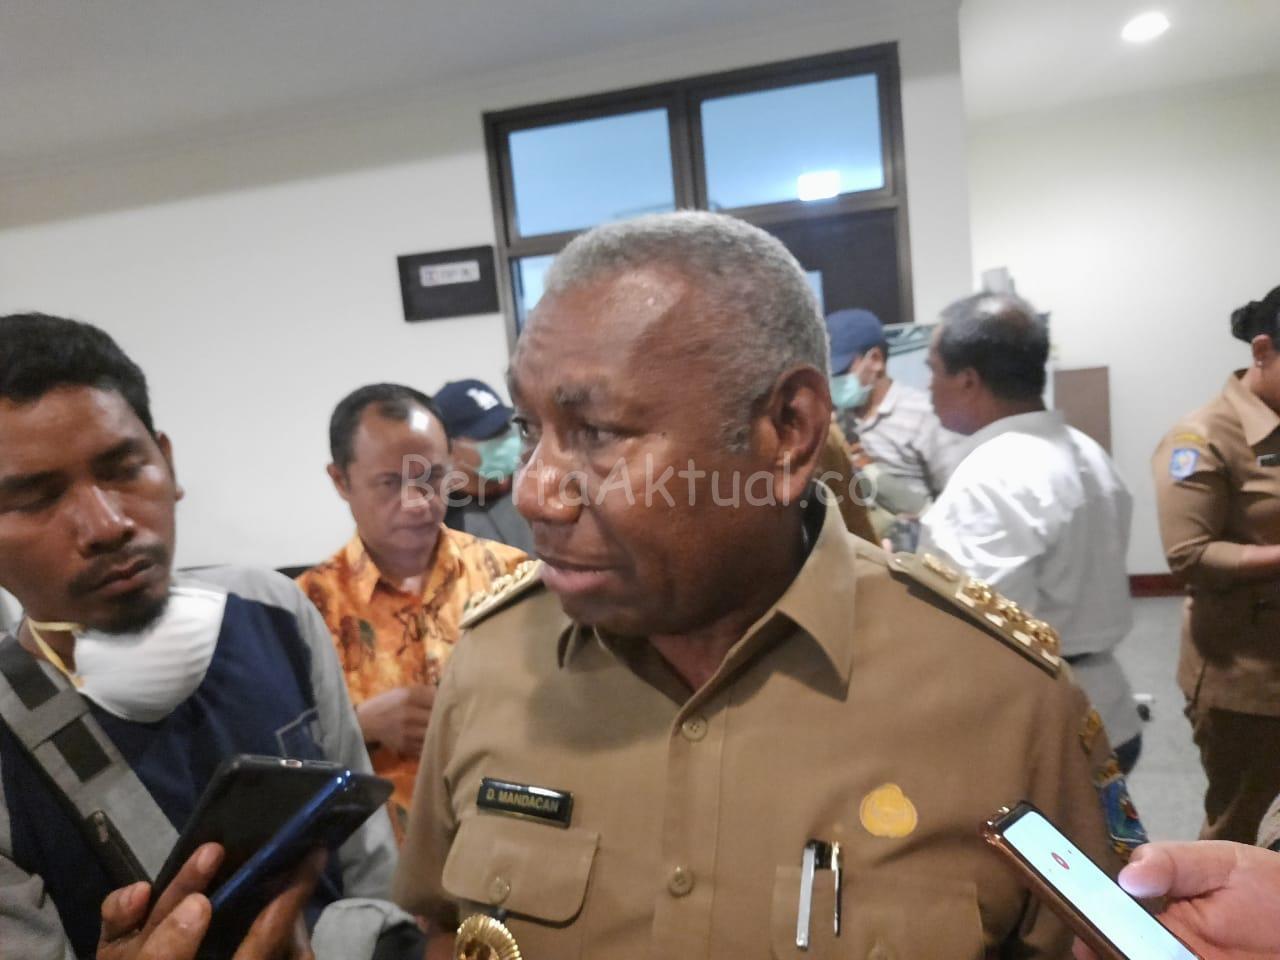 Gubernur: Jika Papua Barat Lockdown Perekonomian Akan Goyah 26 IMG 20200325 WA0004